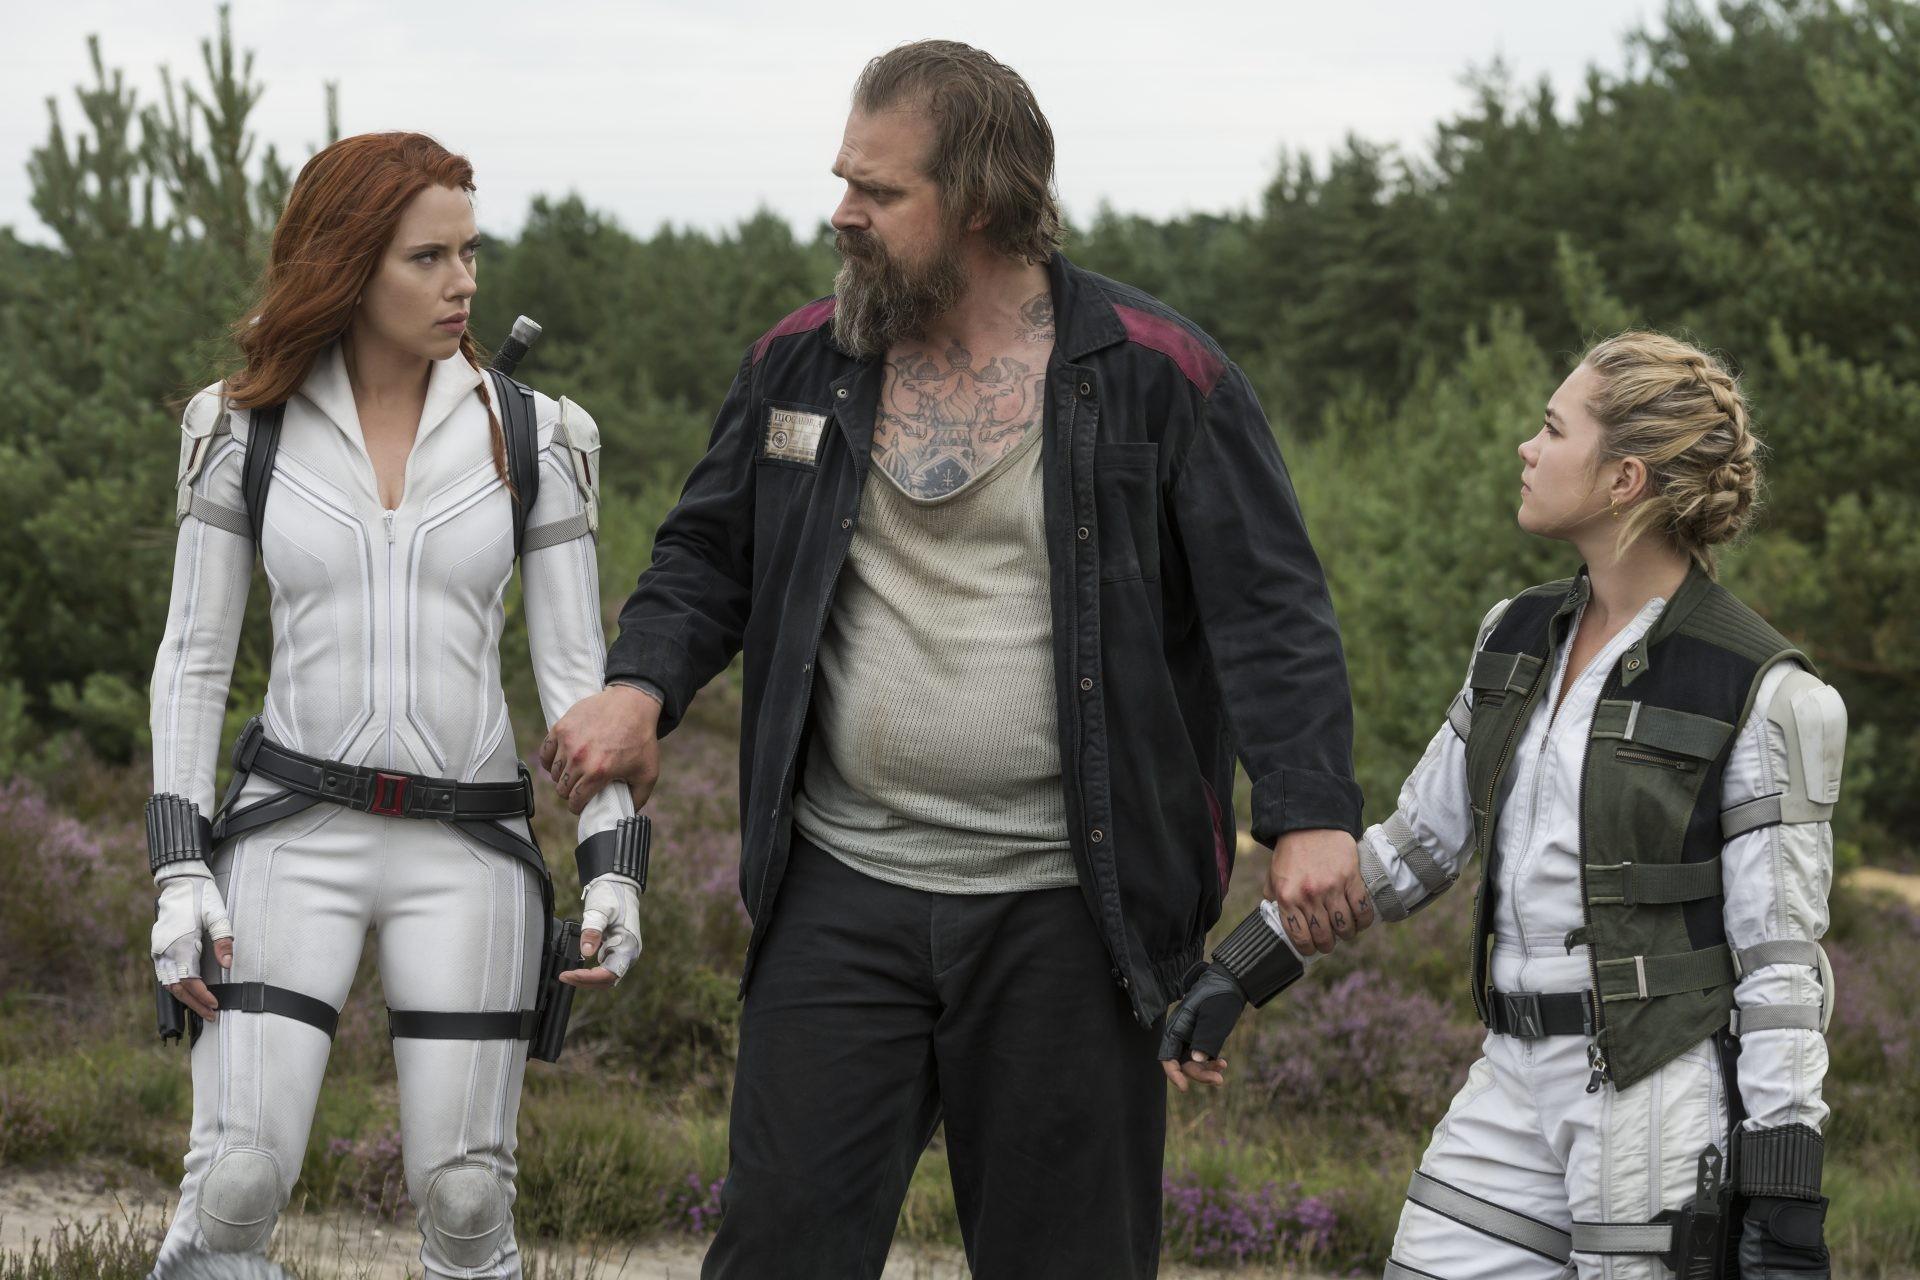 Czarna Wdowa Scarlett Johansson, David Harbour i Florence Pugh